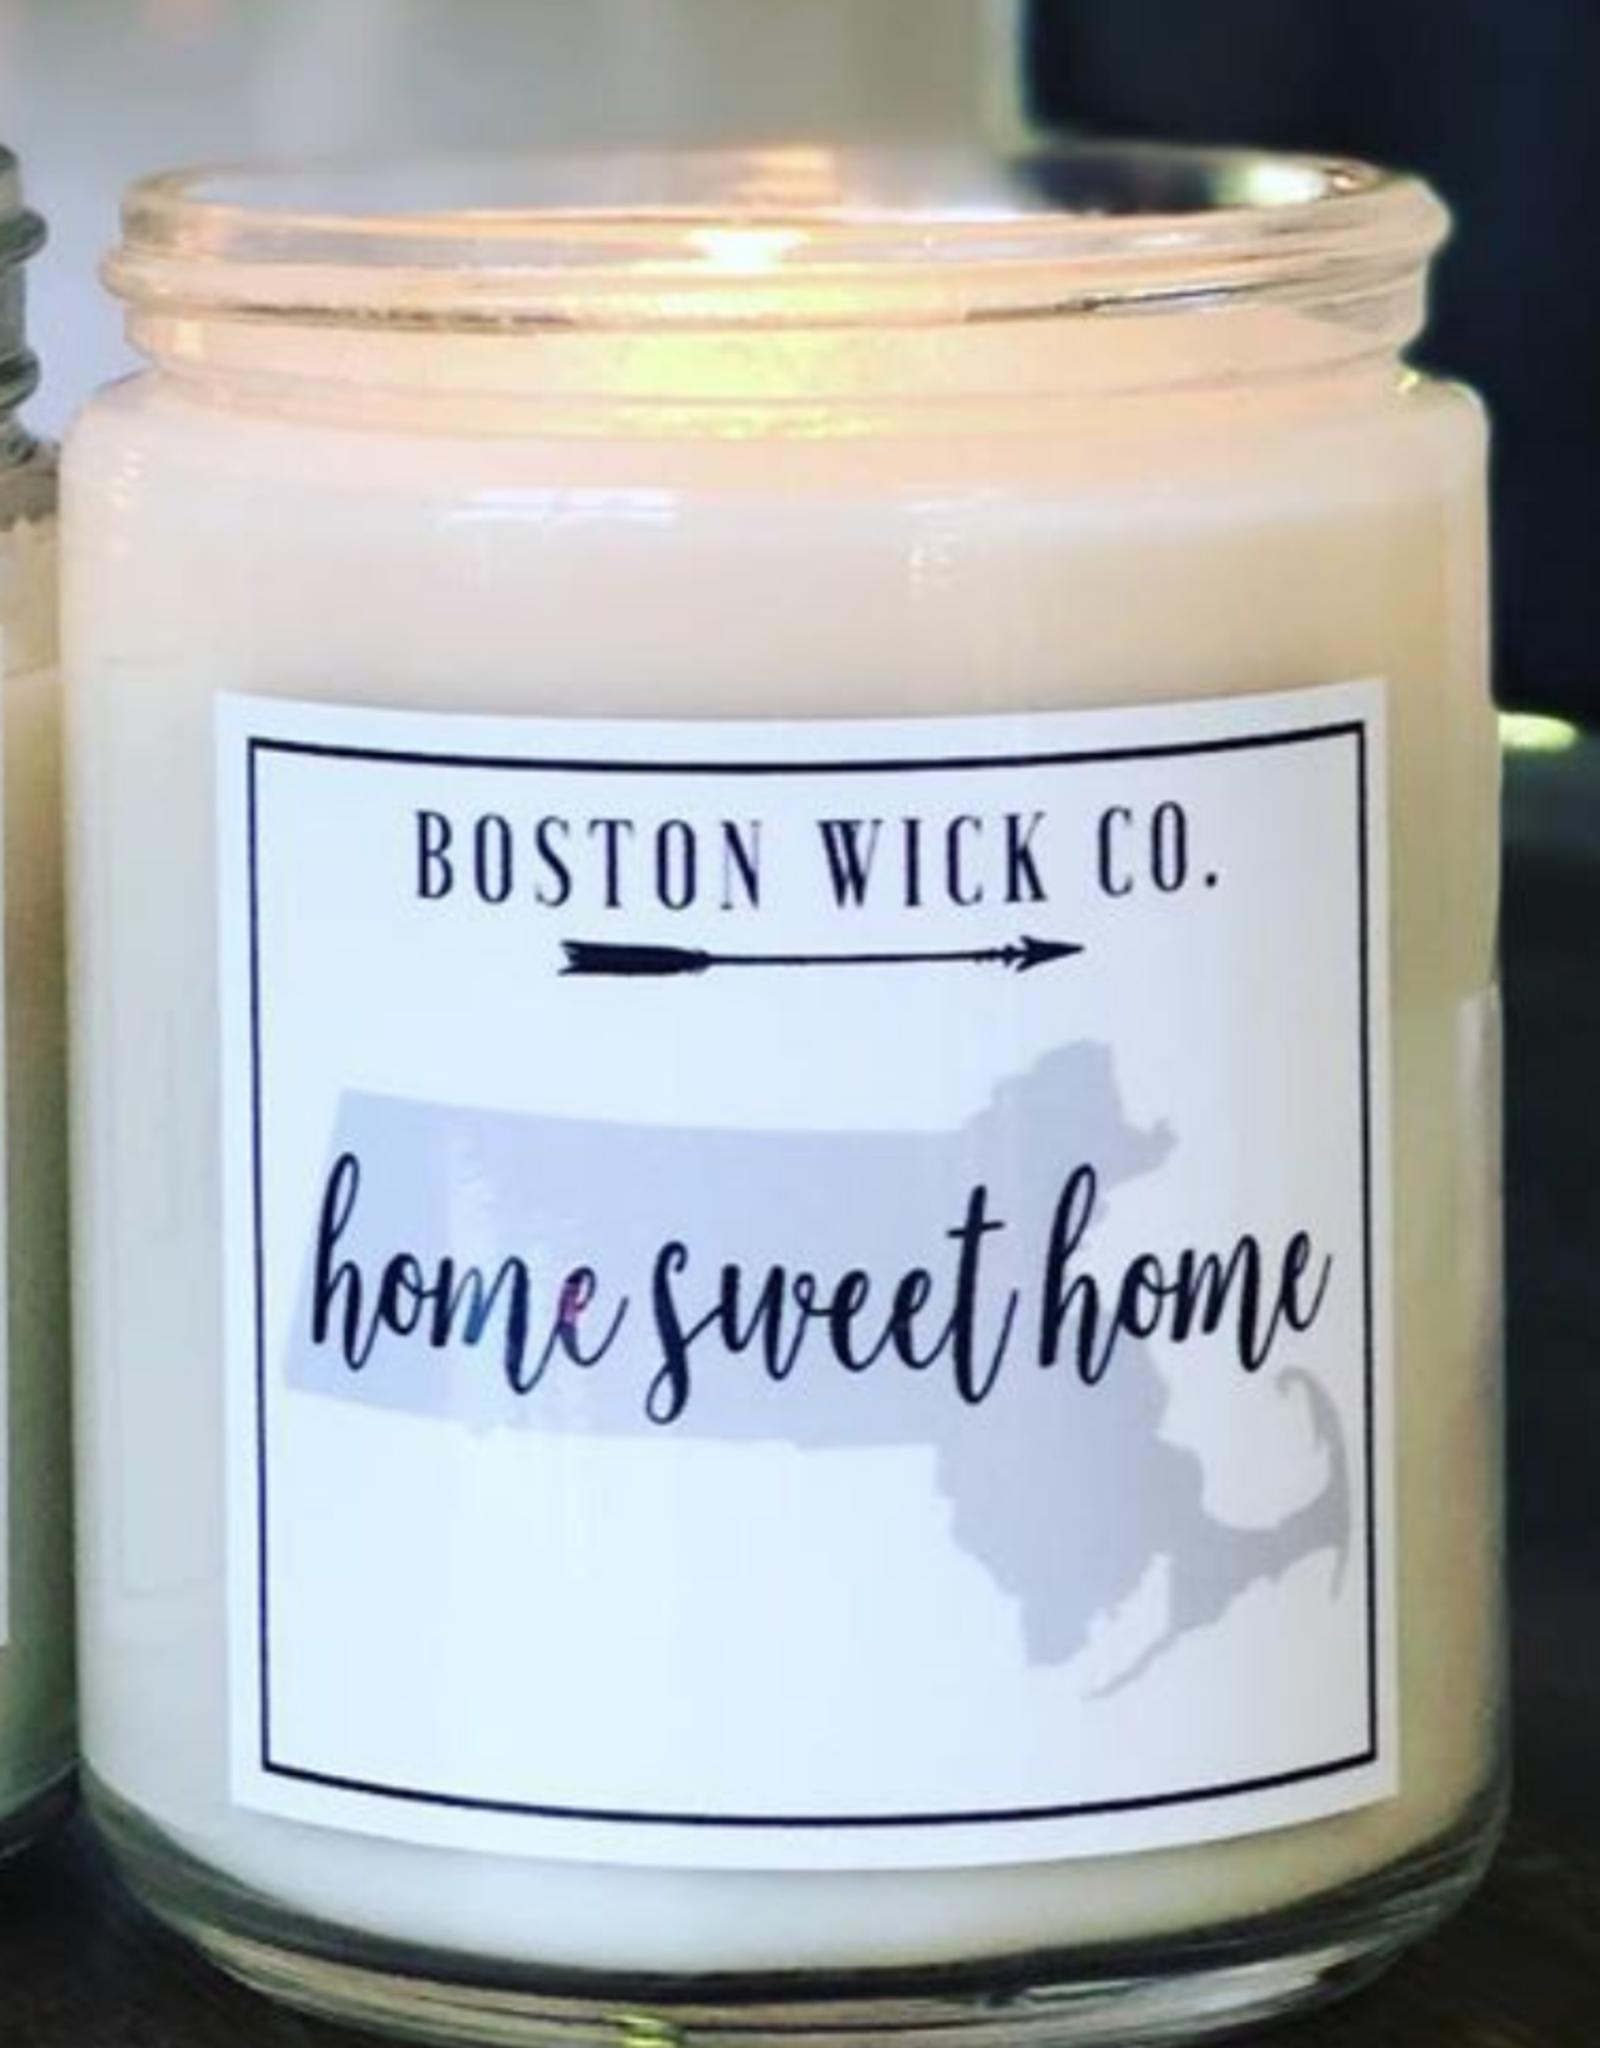 Boston Wick Boston Wick Company - Home Sweet Home